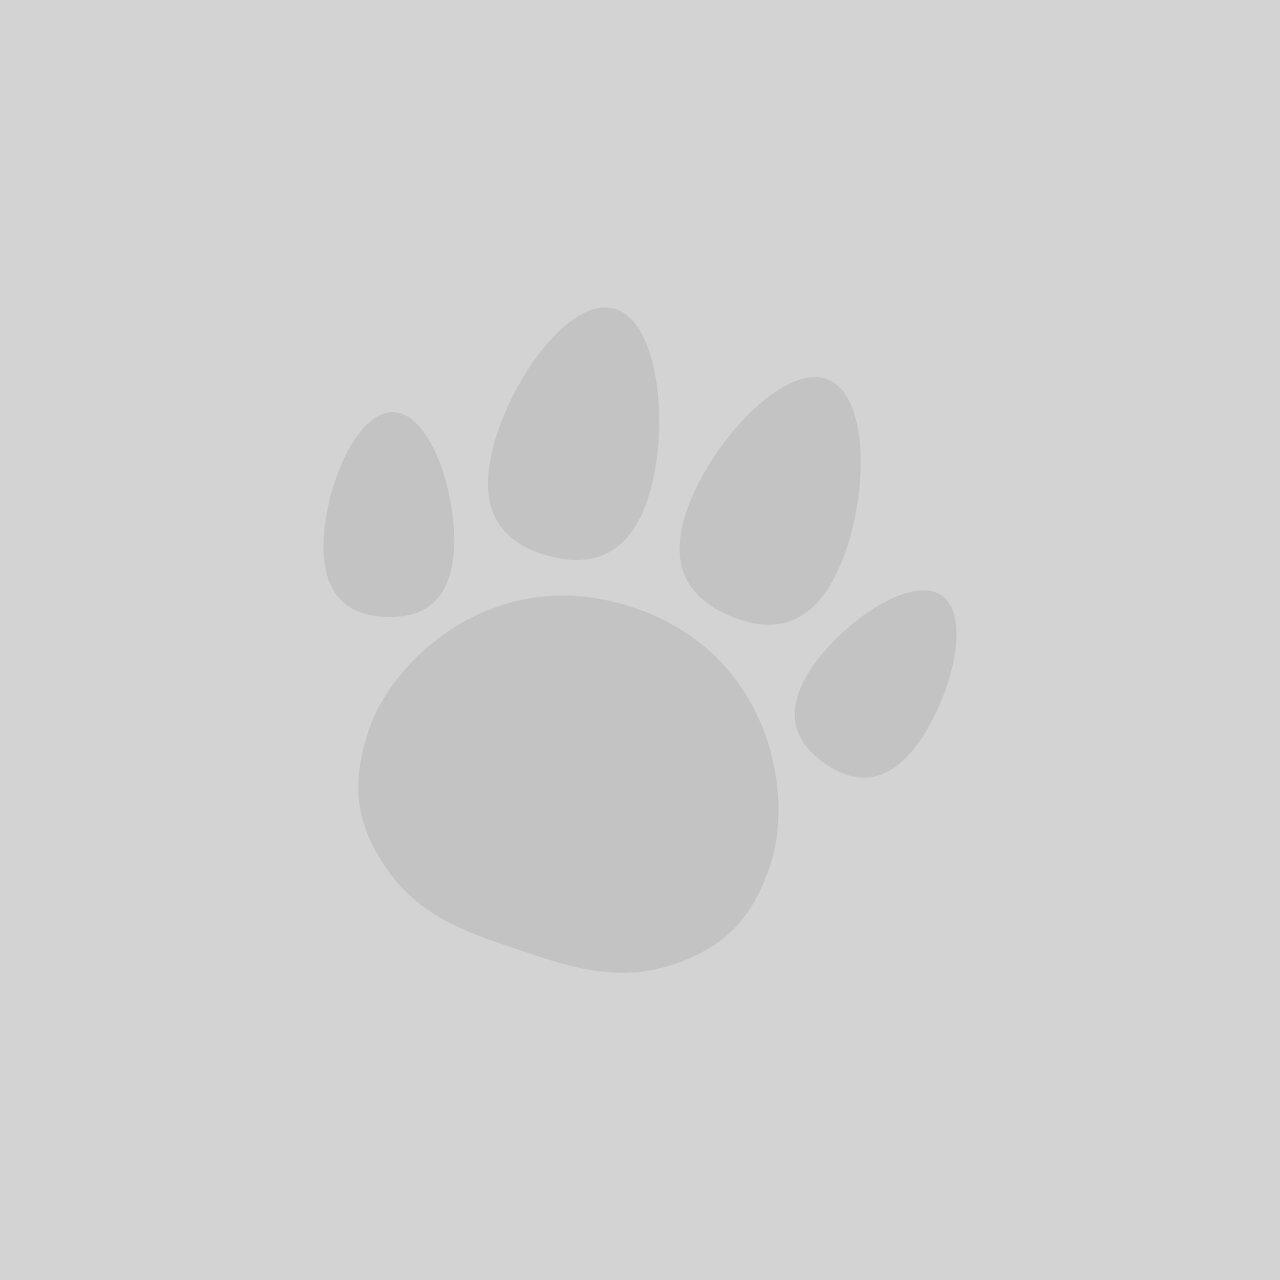 Beaphar Cat Flea Collar Glitter - Assorted Colours